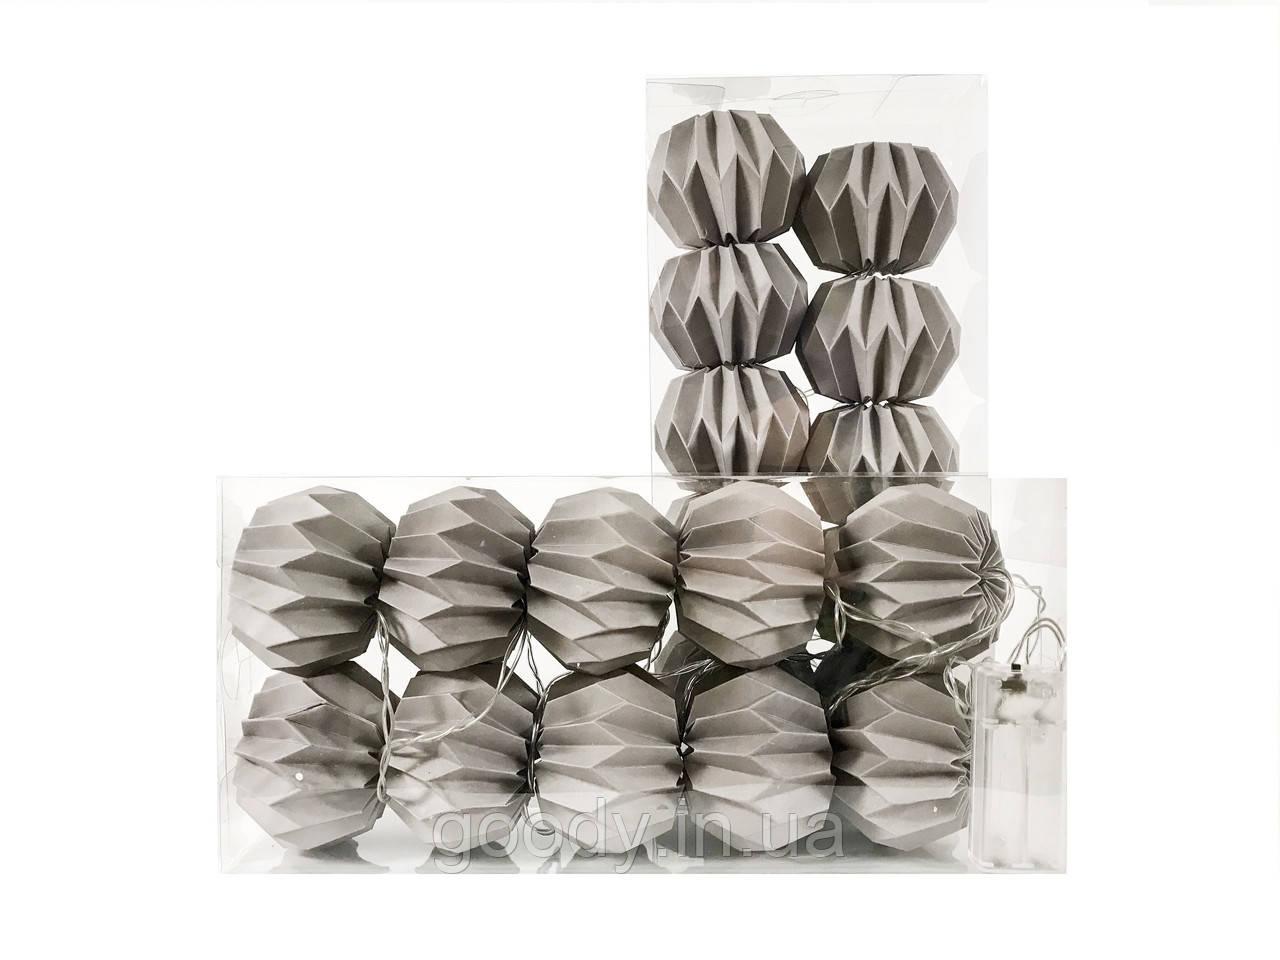 Гірлянда Decorino Grey Paper Balls 10led, діам 7.5см, довж 235см на батарейках АА